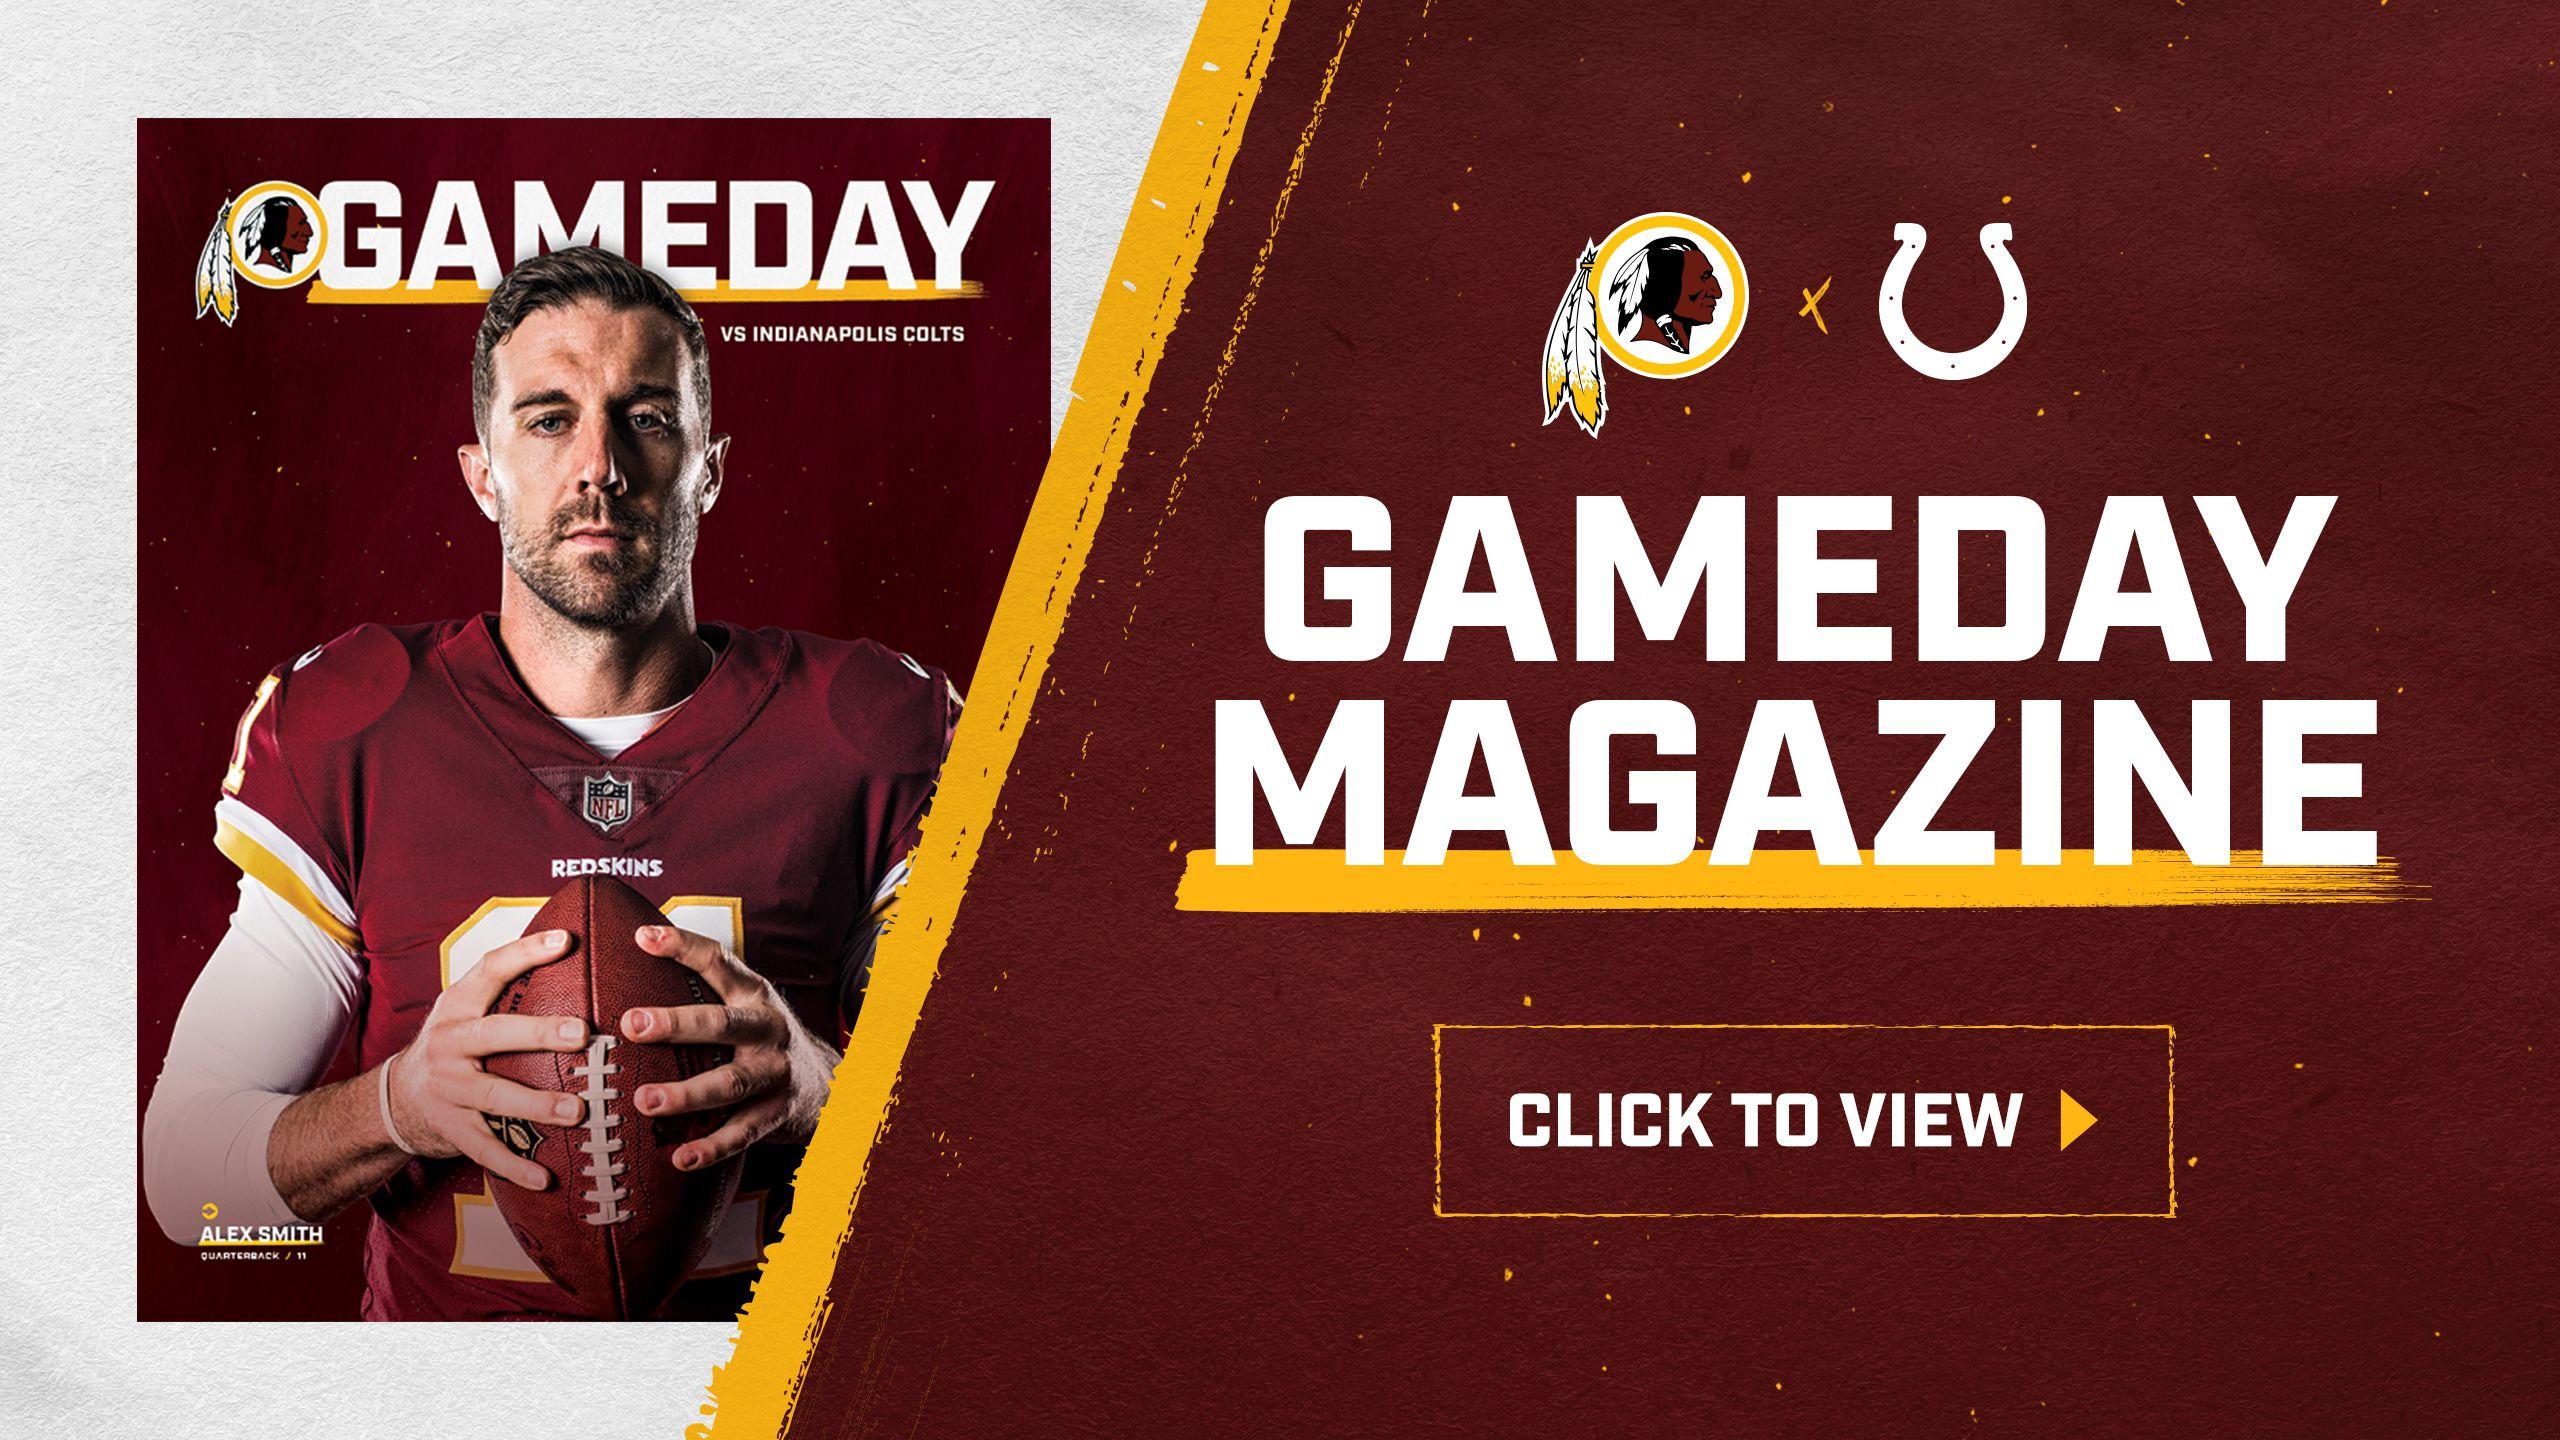 Washington Redskins vs Indianapolis Colts